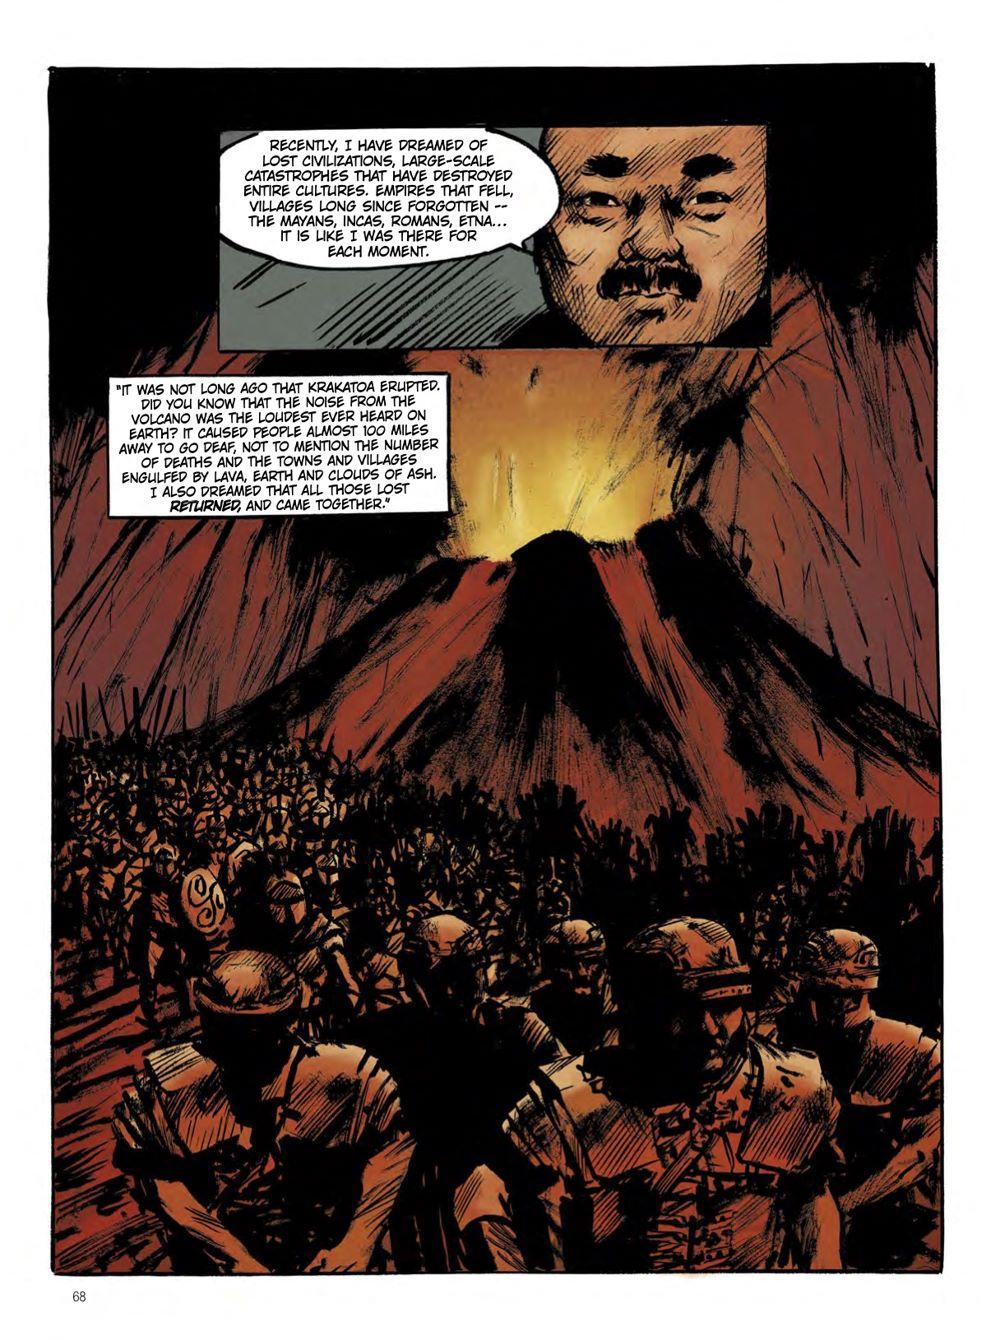 snowpiercer_the_prequel-extinction-5 ComicList Previews: SNOWPIERCER PREQUEL VOLUME 1 EXTINCTION GN